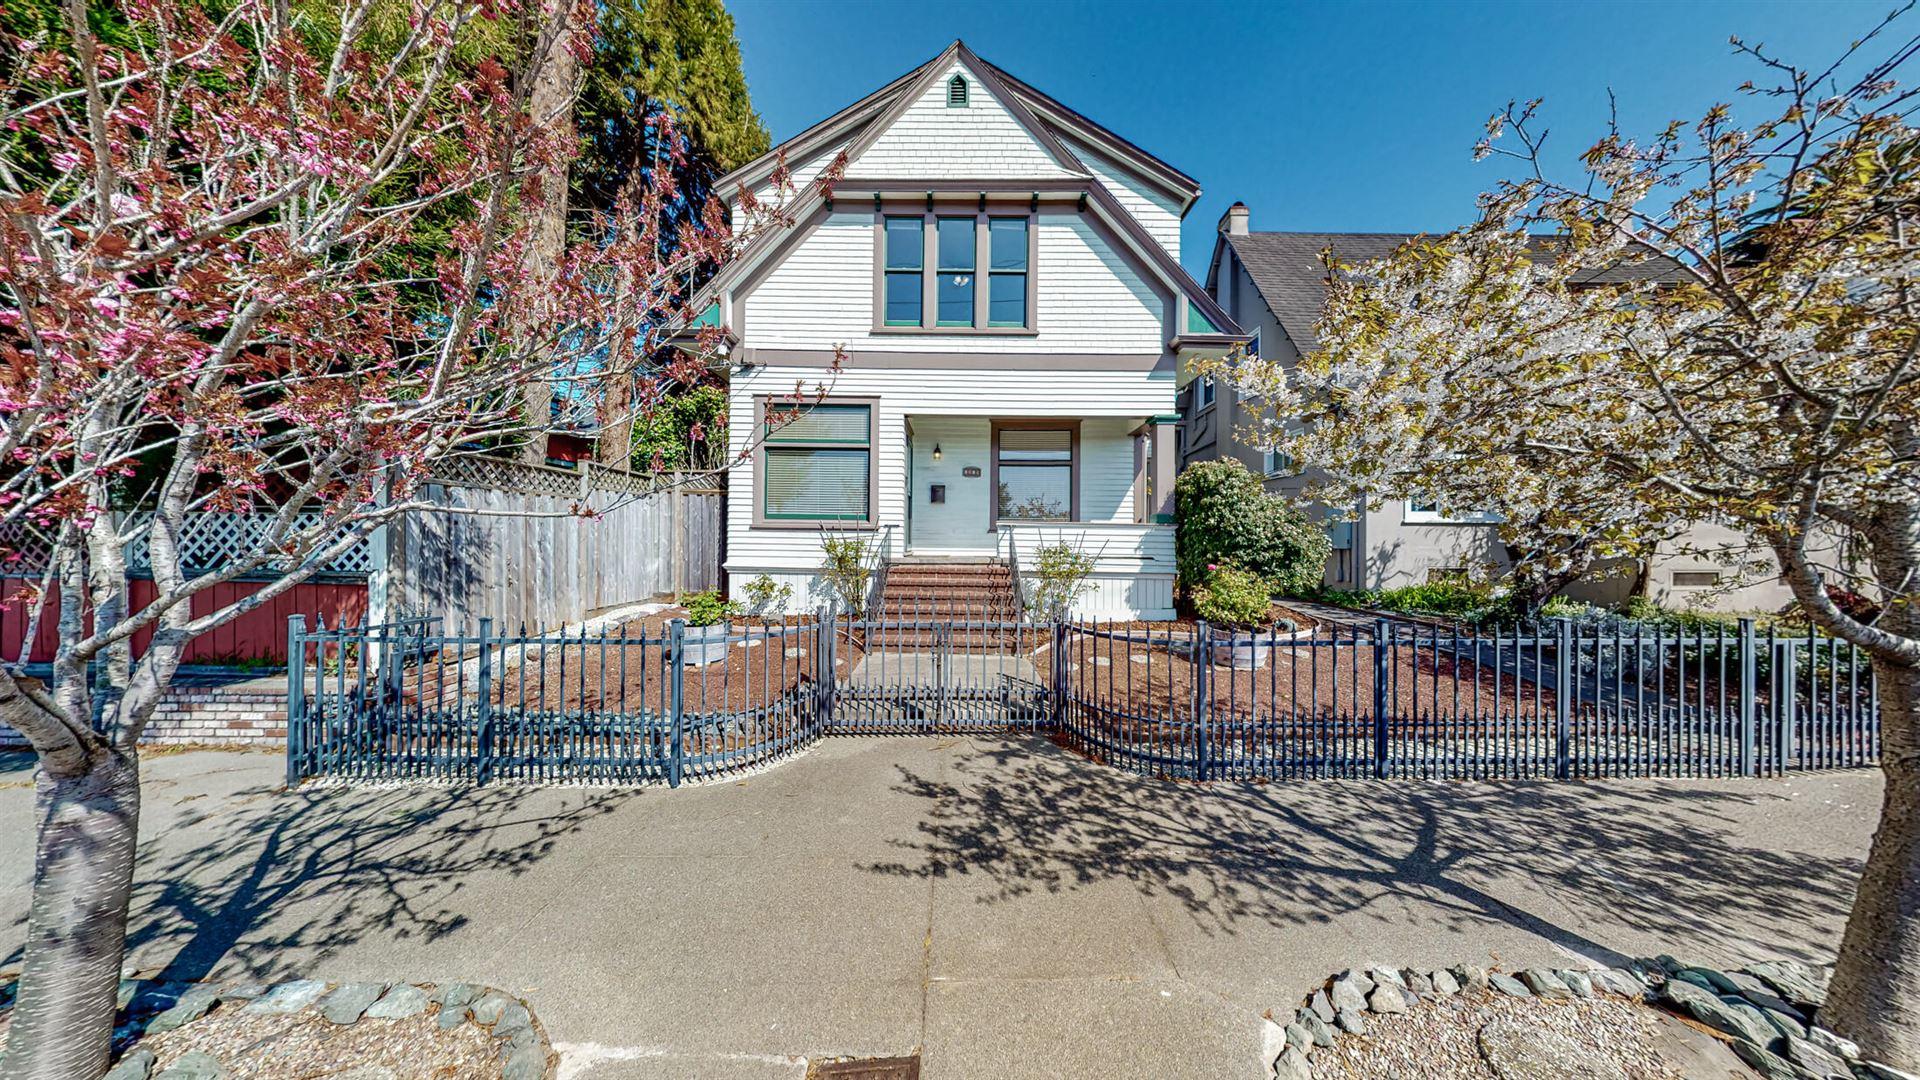 1819 H Street, Eureka, CA 95501 - MLS#: 258779